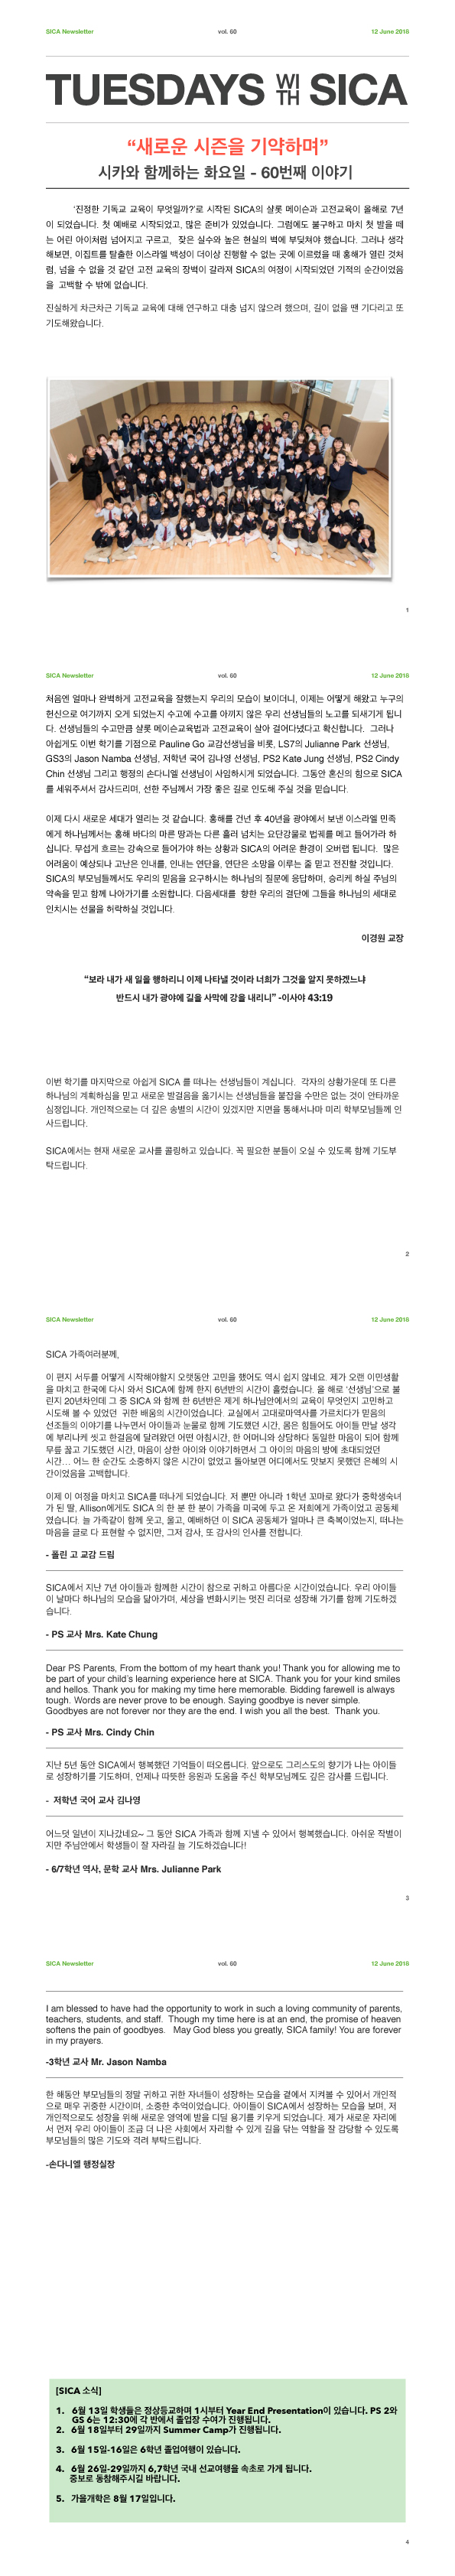 SICA letter-60